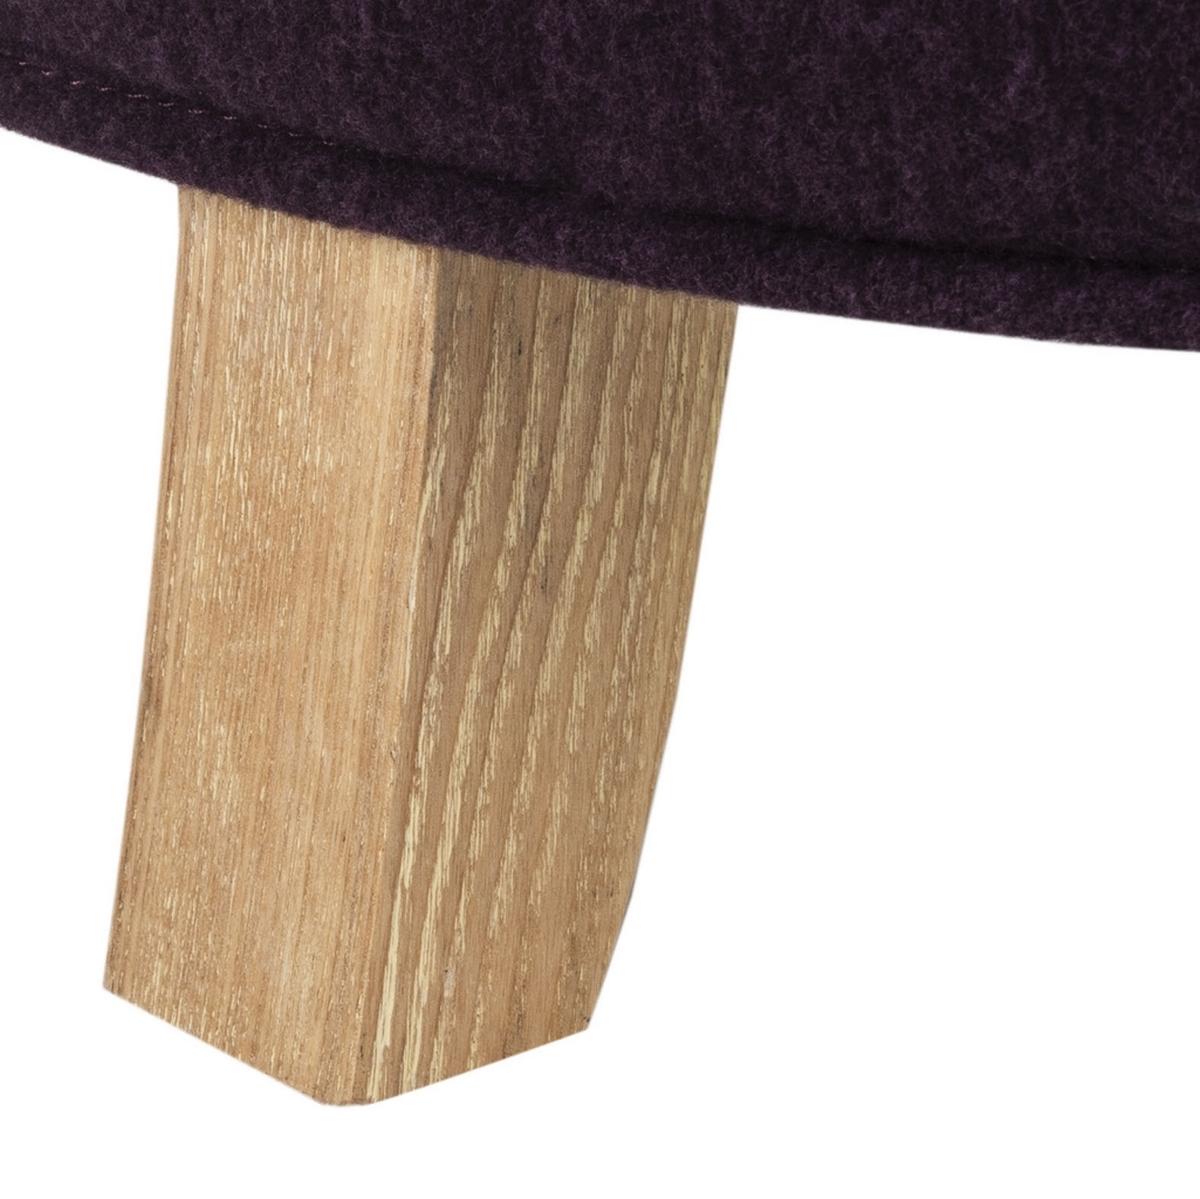 Fabulous Hud8220T Ottomans Furniture By Safavieh Ncnpc Chair Design For Home Ncnpcorg